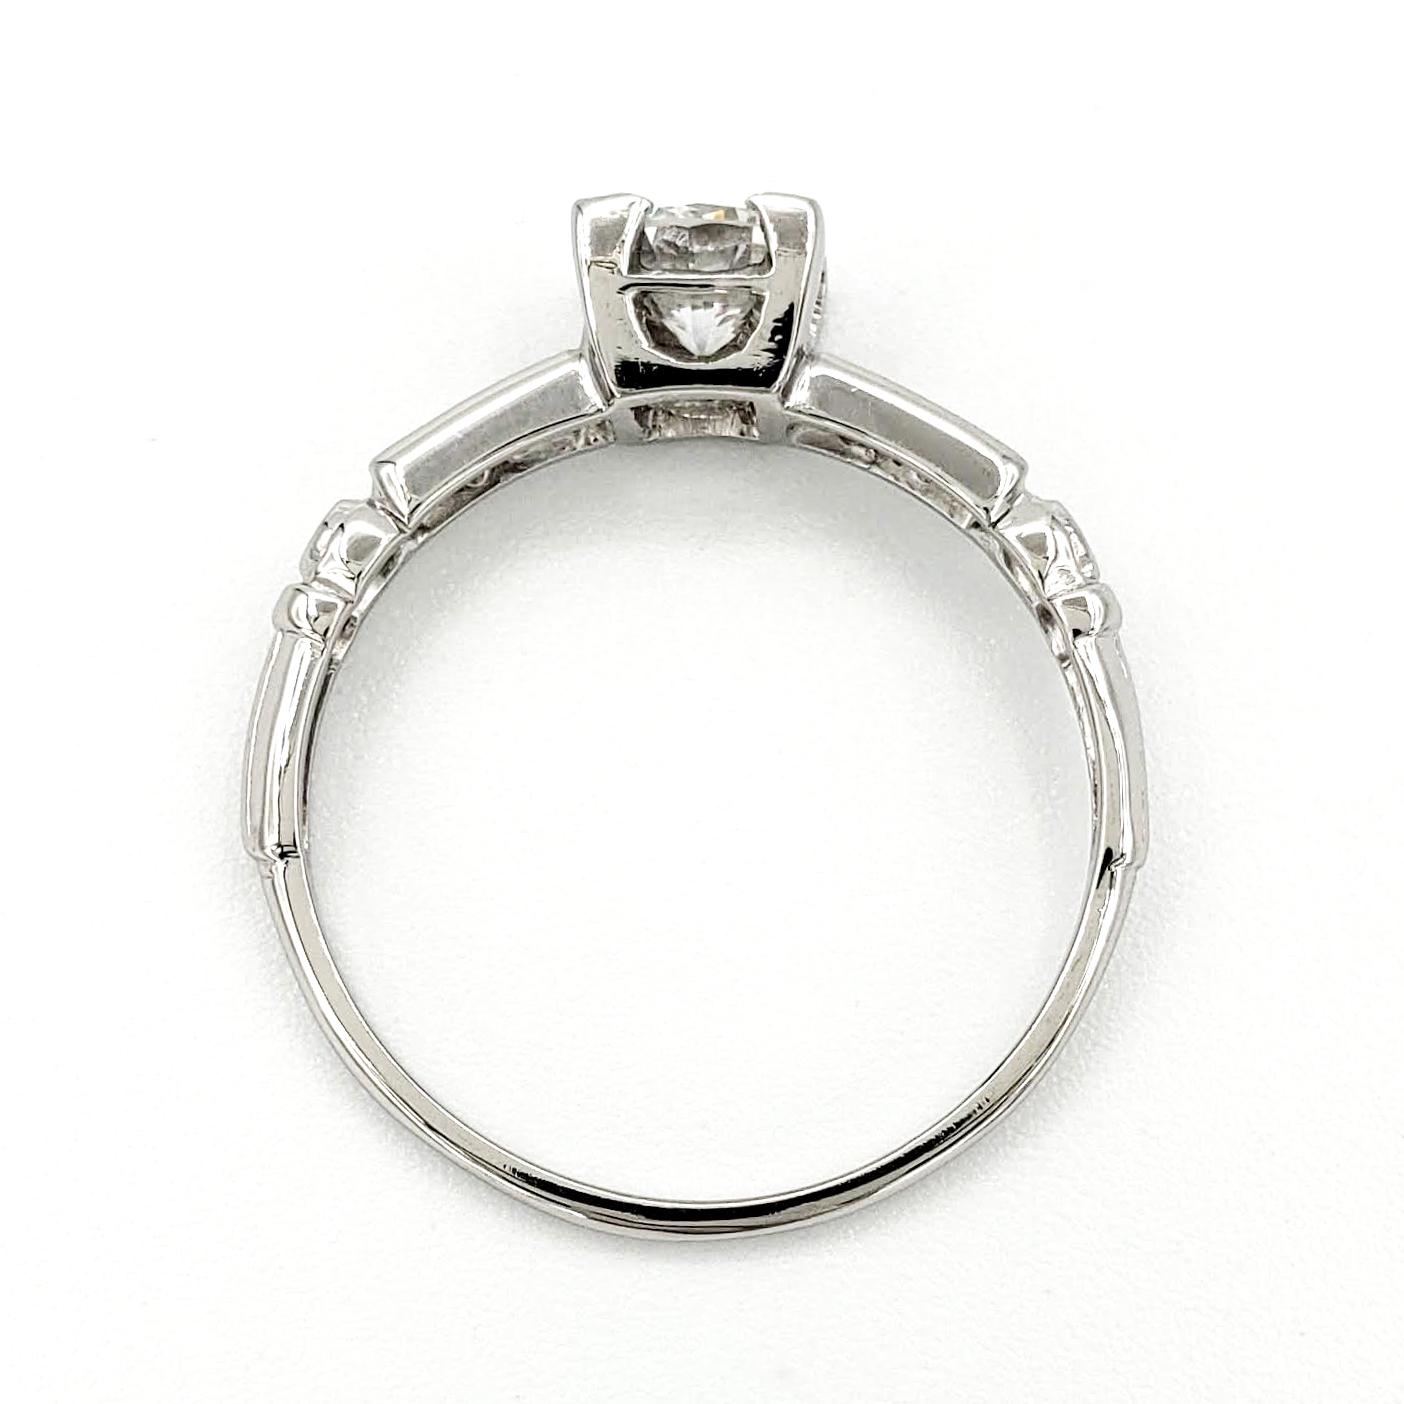 vintage-platinum-engagement-ring-with-0-42-carat-round-brilliant-cut-diamond-egl-e-vs2